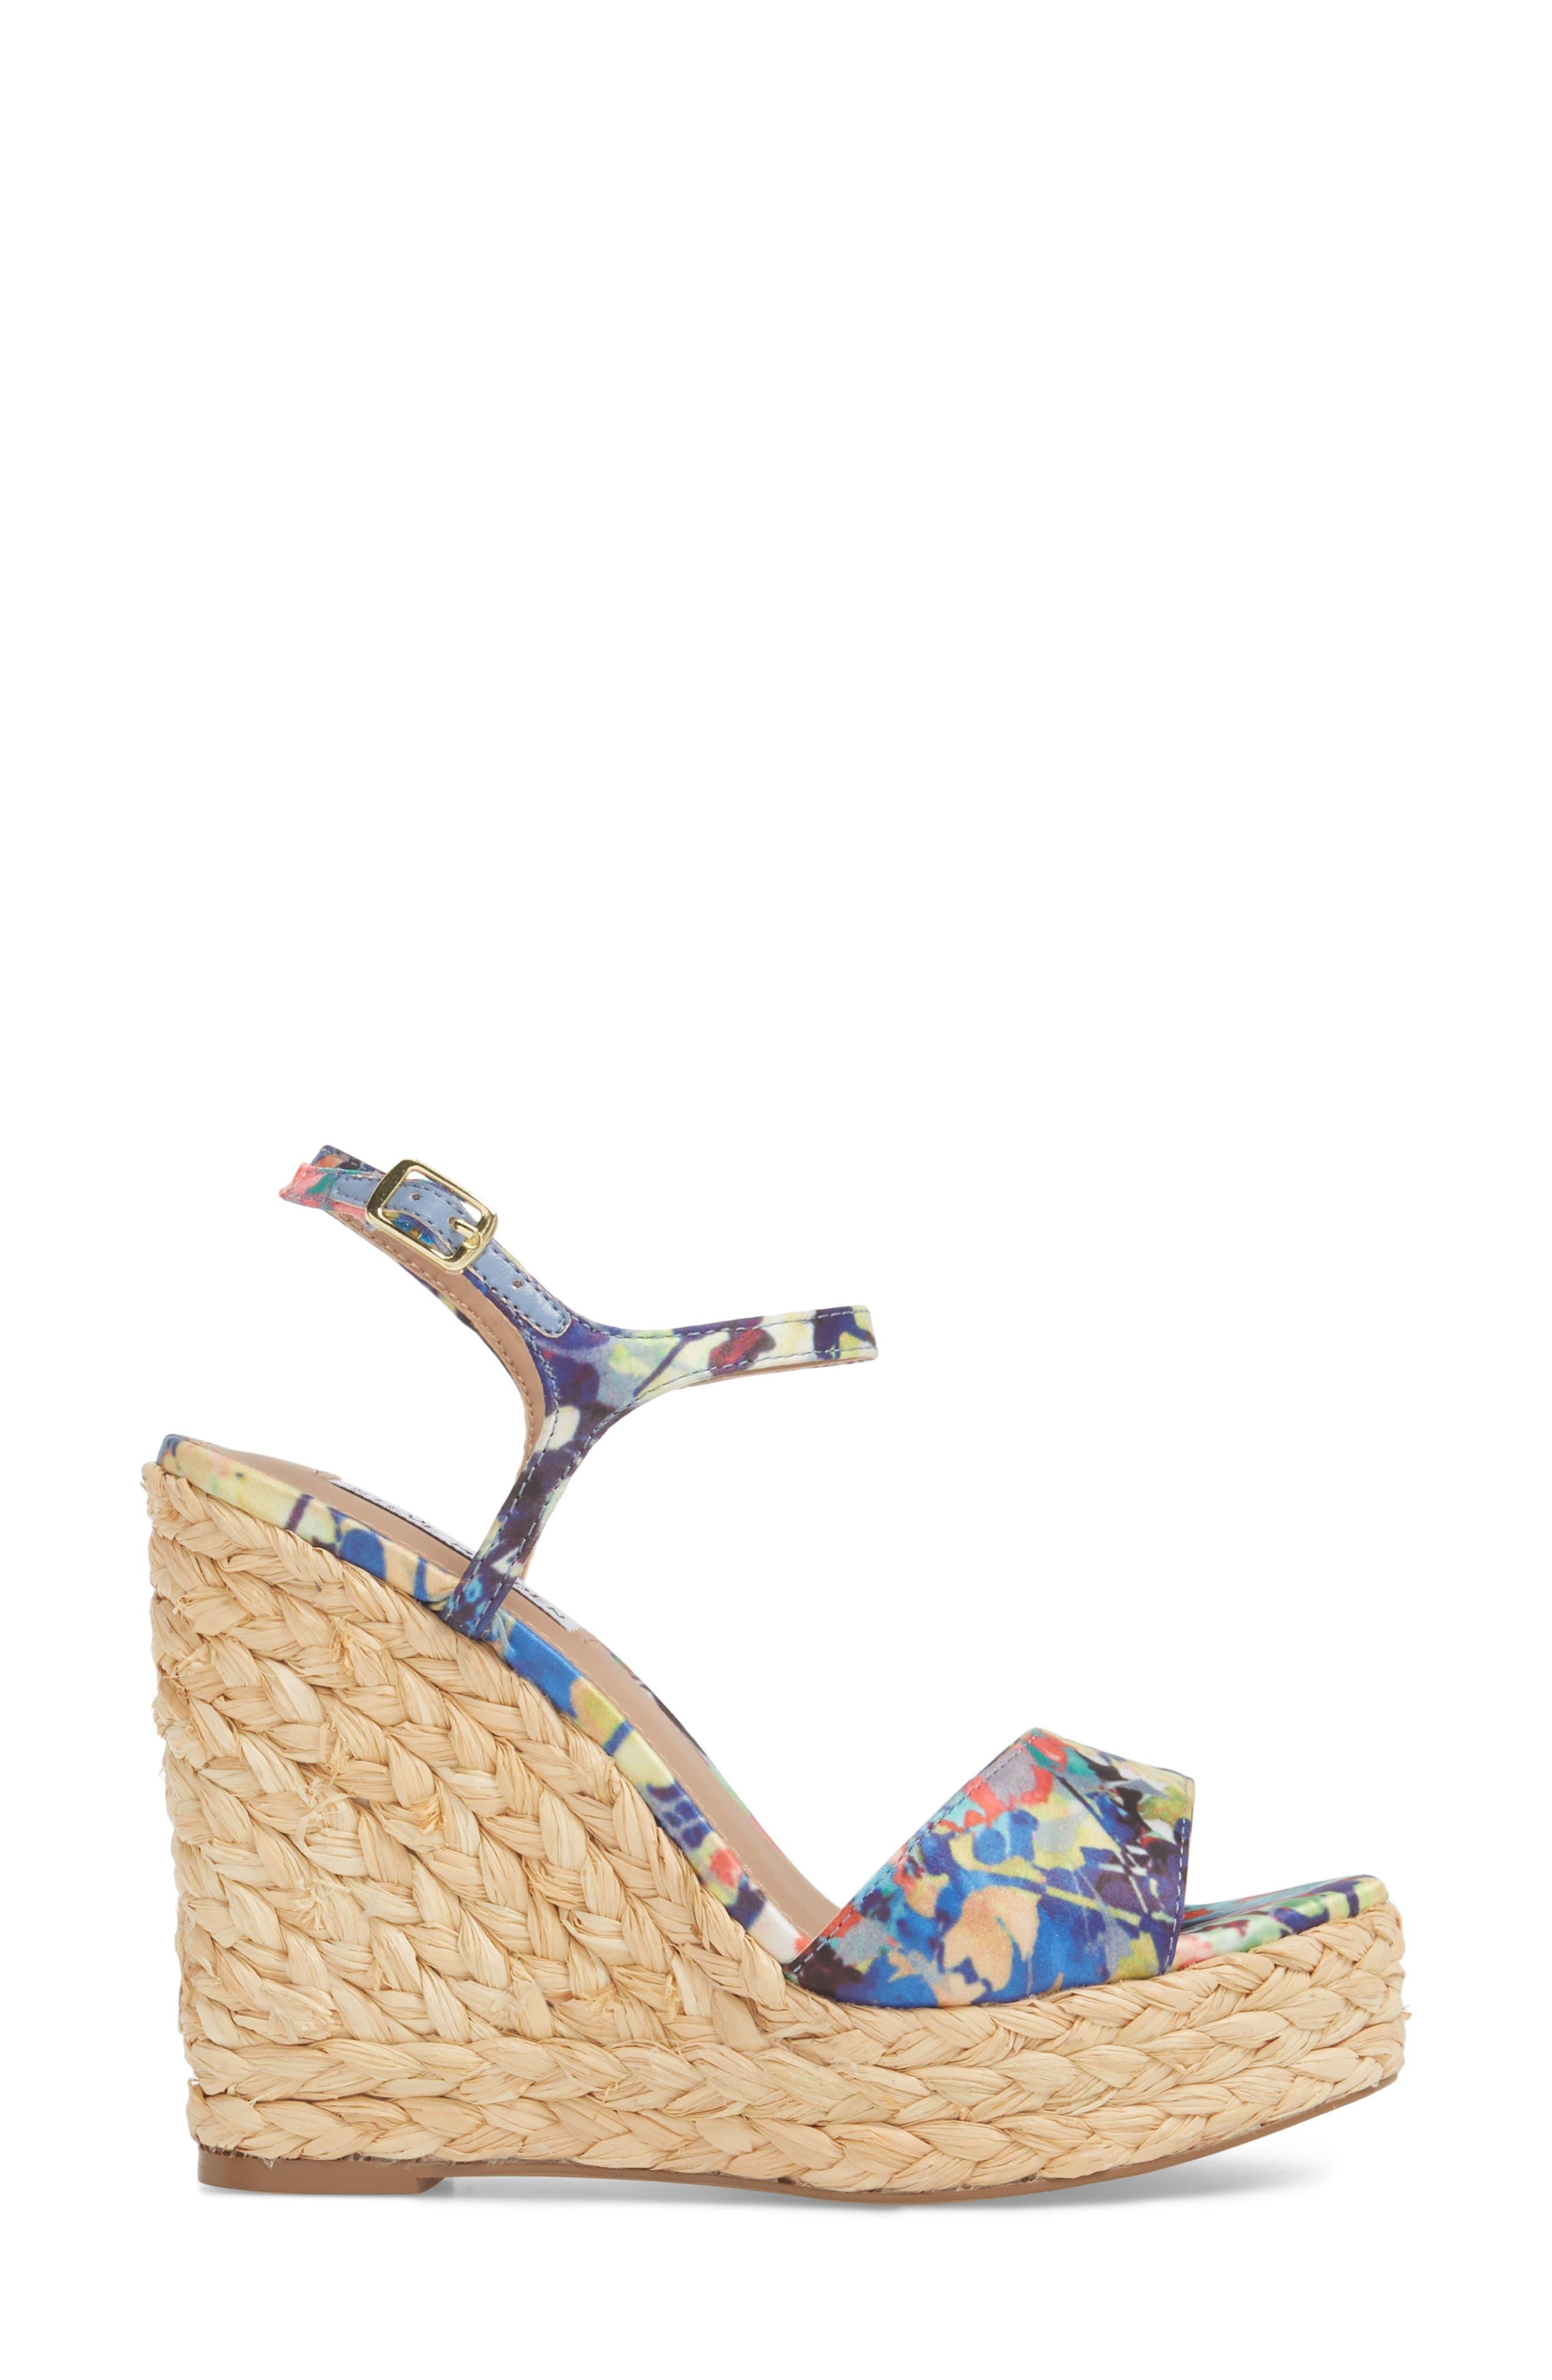 Tokin Espadrille Wedge Sandal,                             Alternate thumbnail 3, color,                             Floral Multi